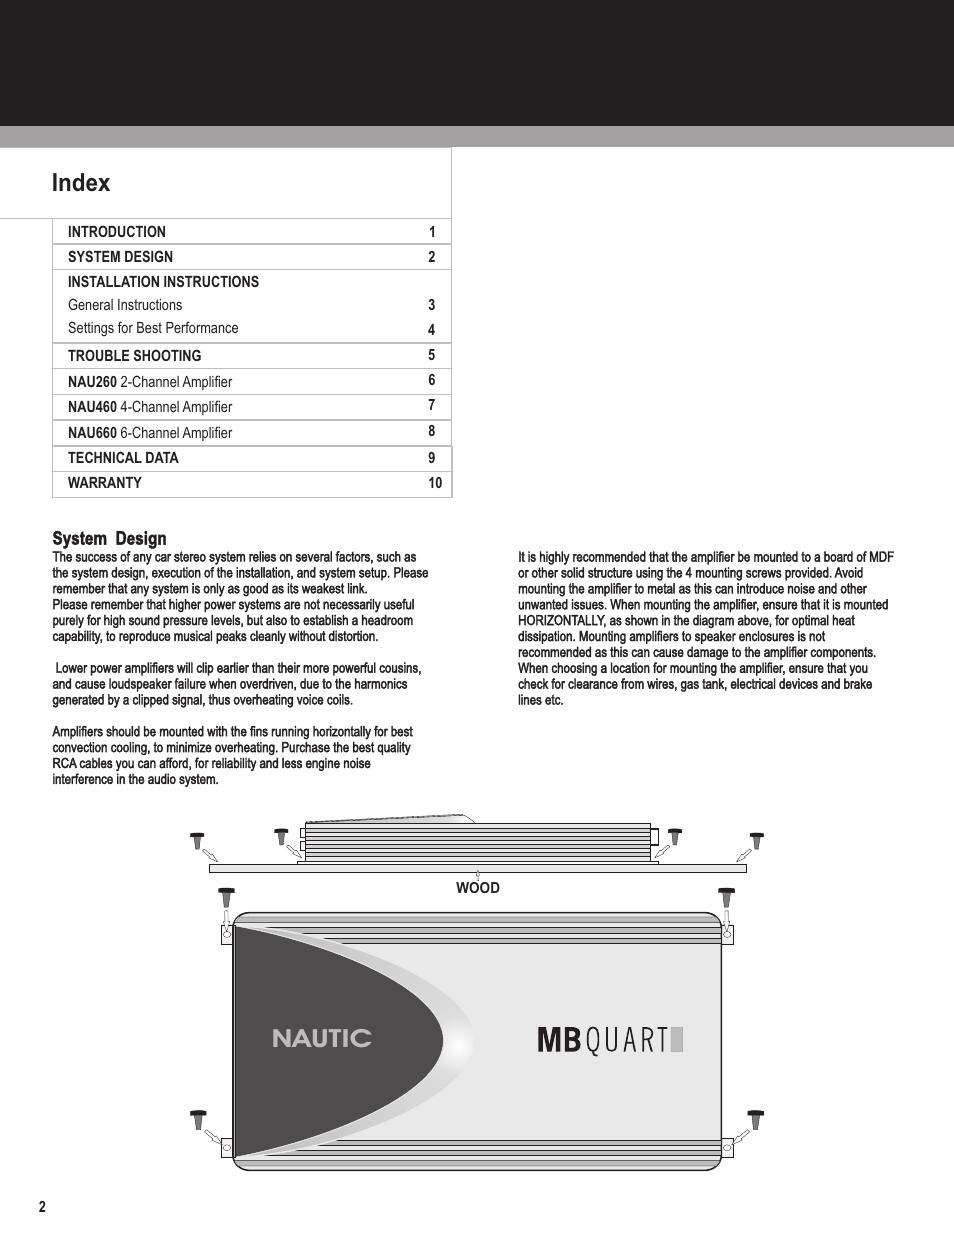 medium resolution of nautic index mb quart nautic amplifier nau460 user manual page 2 10